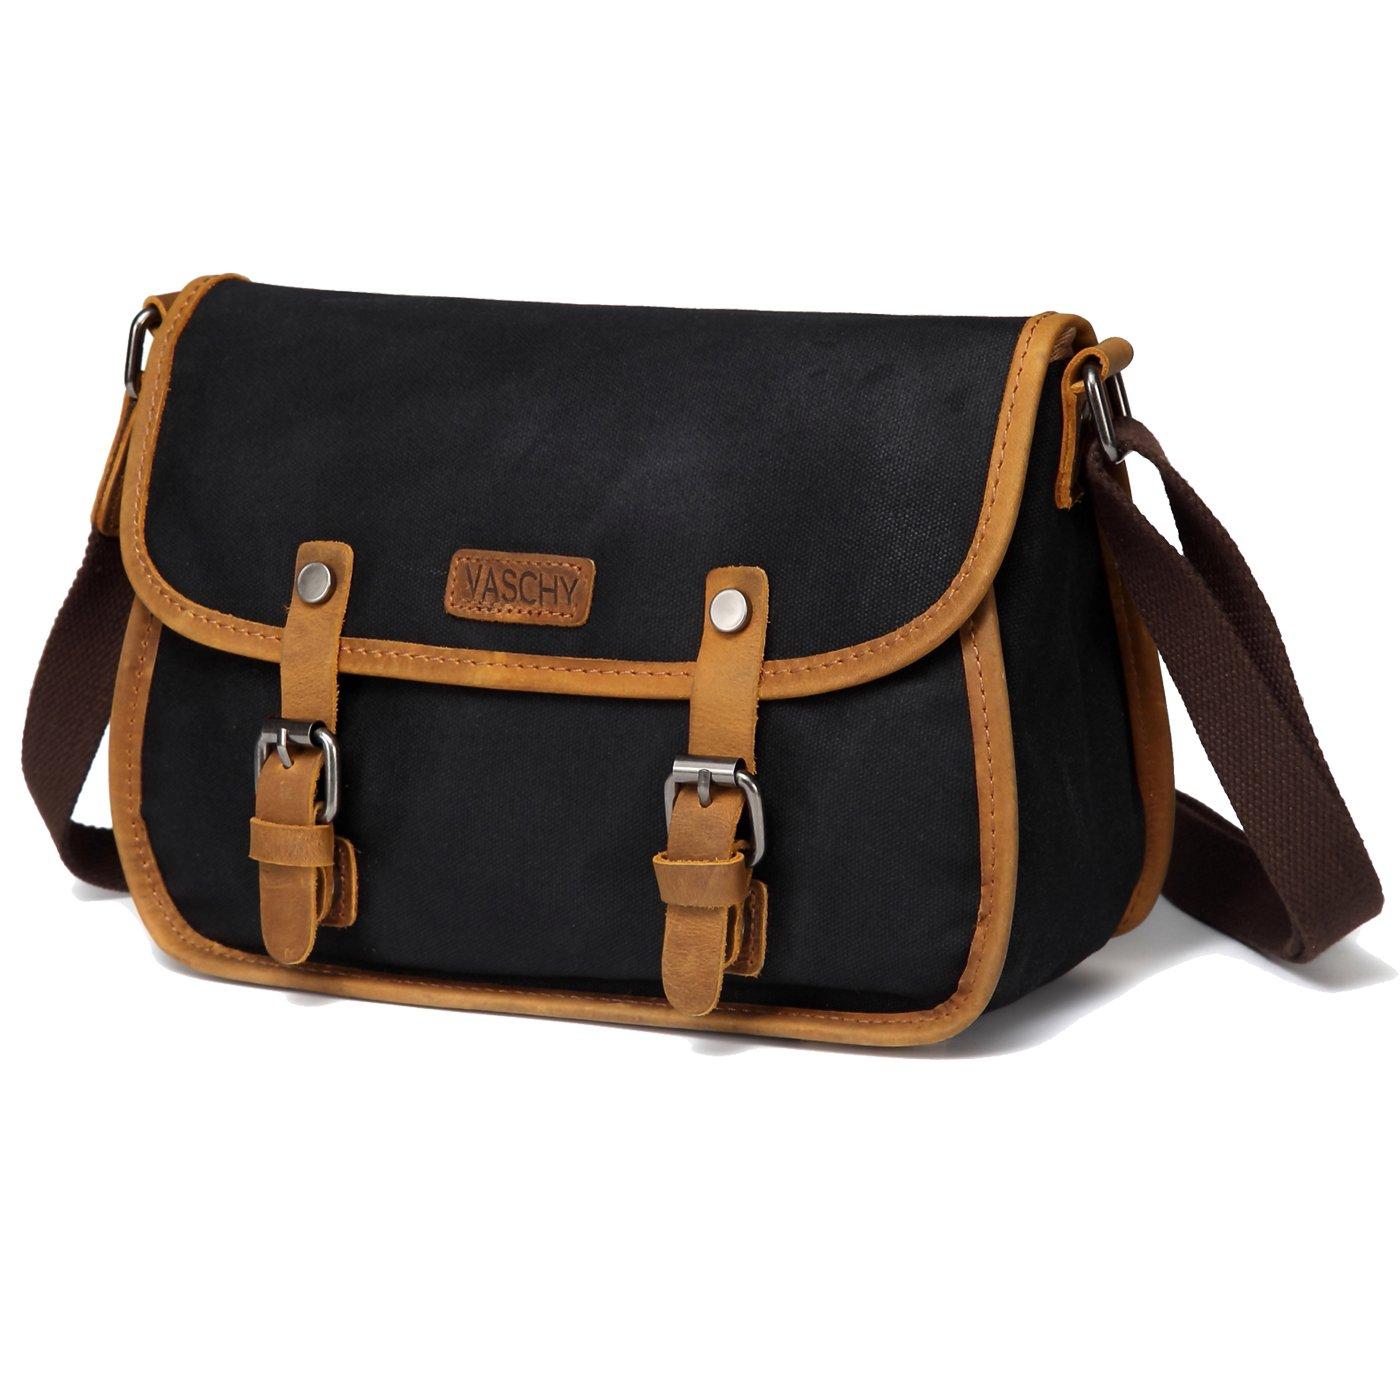 4d108af683e2 Crossbody Bag for Women, VASCHY Vintage Leather Waxed Canvas Flap Small  Shoulder Bag for Women Black: Handbags: Amazon.com